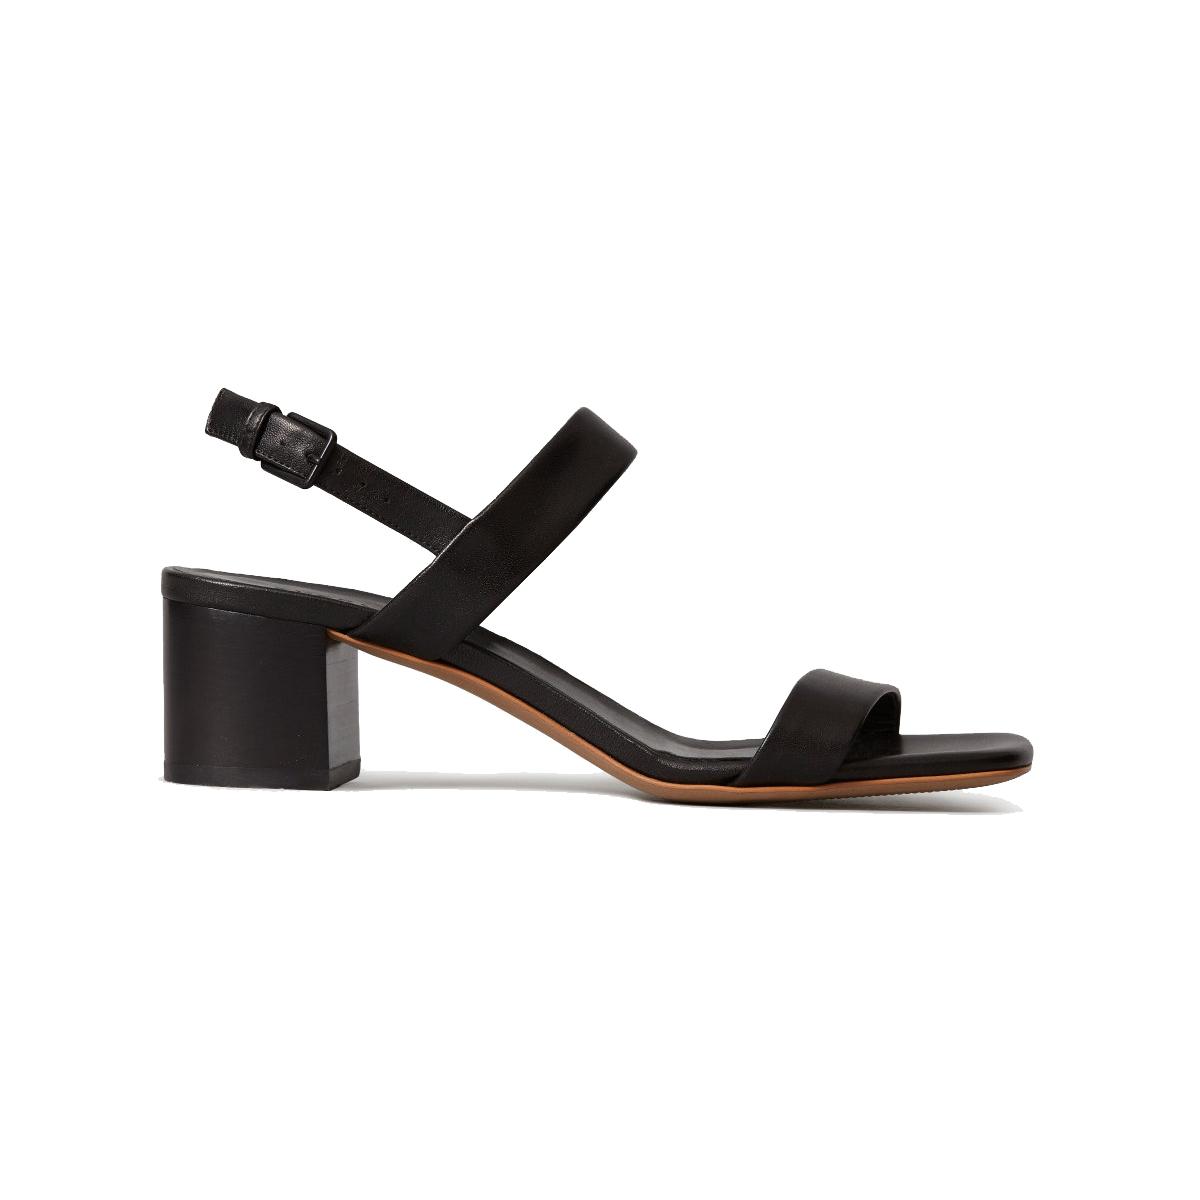 Everlane The Double-Strap Block Heel Sandal in Black